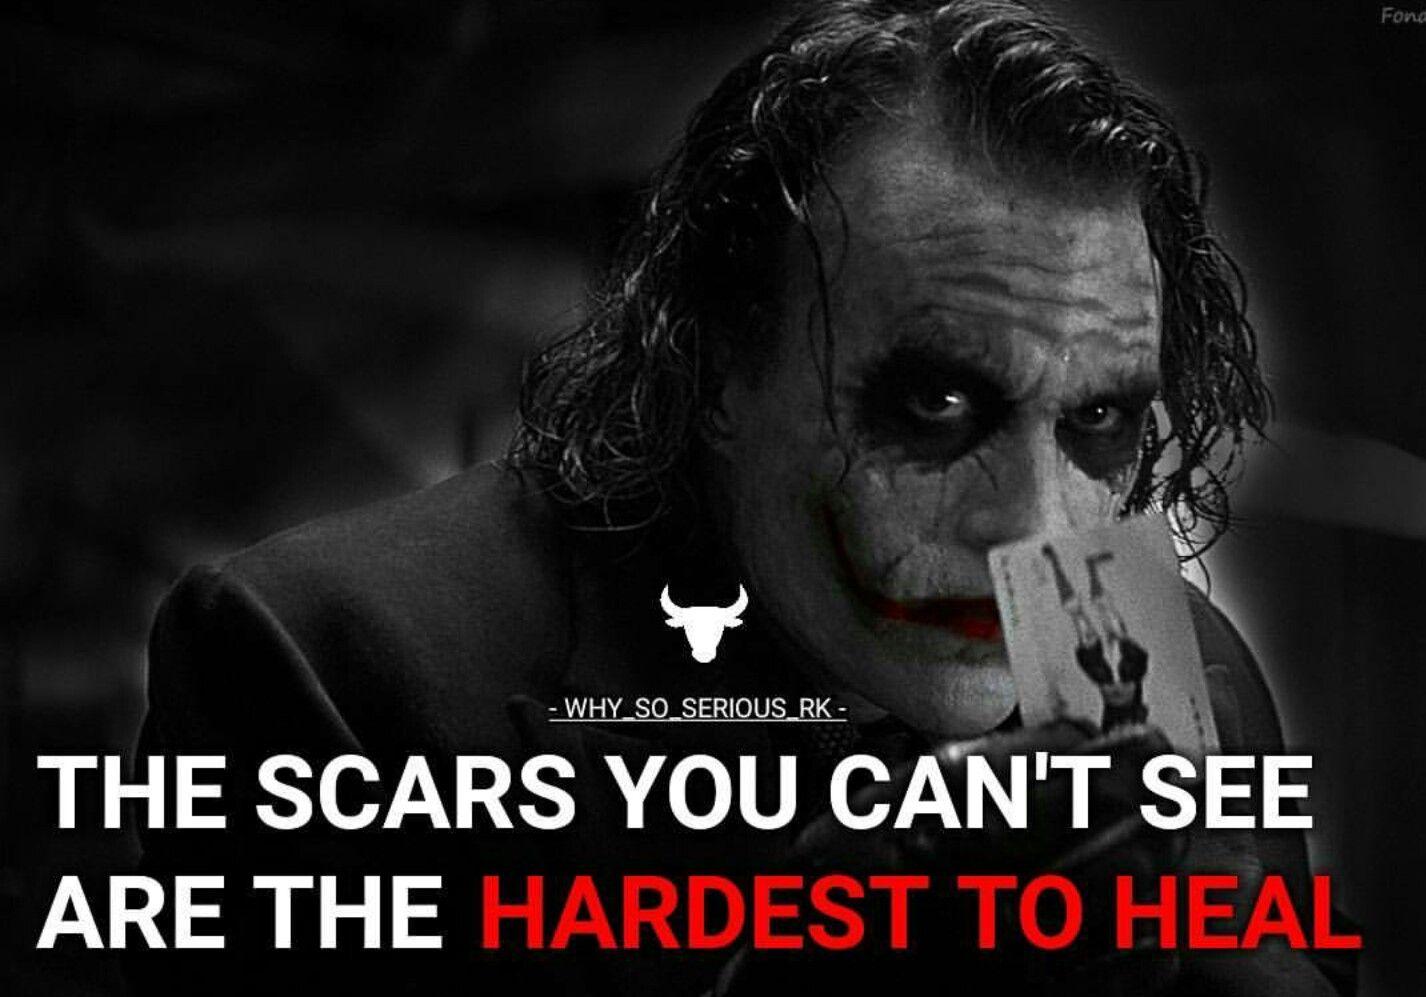 Joker Quotes: Verdades Irrefutables Joker T Quotes Joker Quotes And